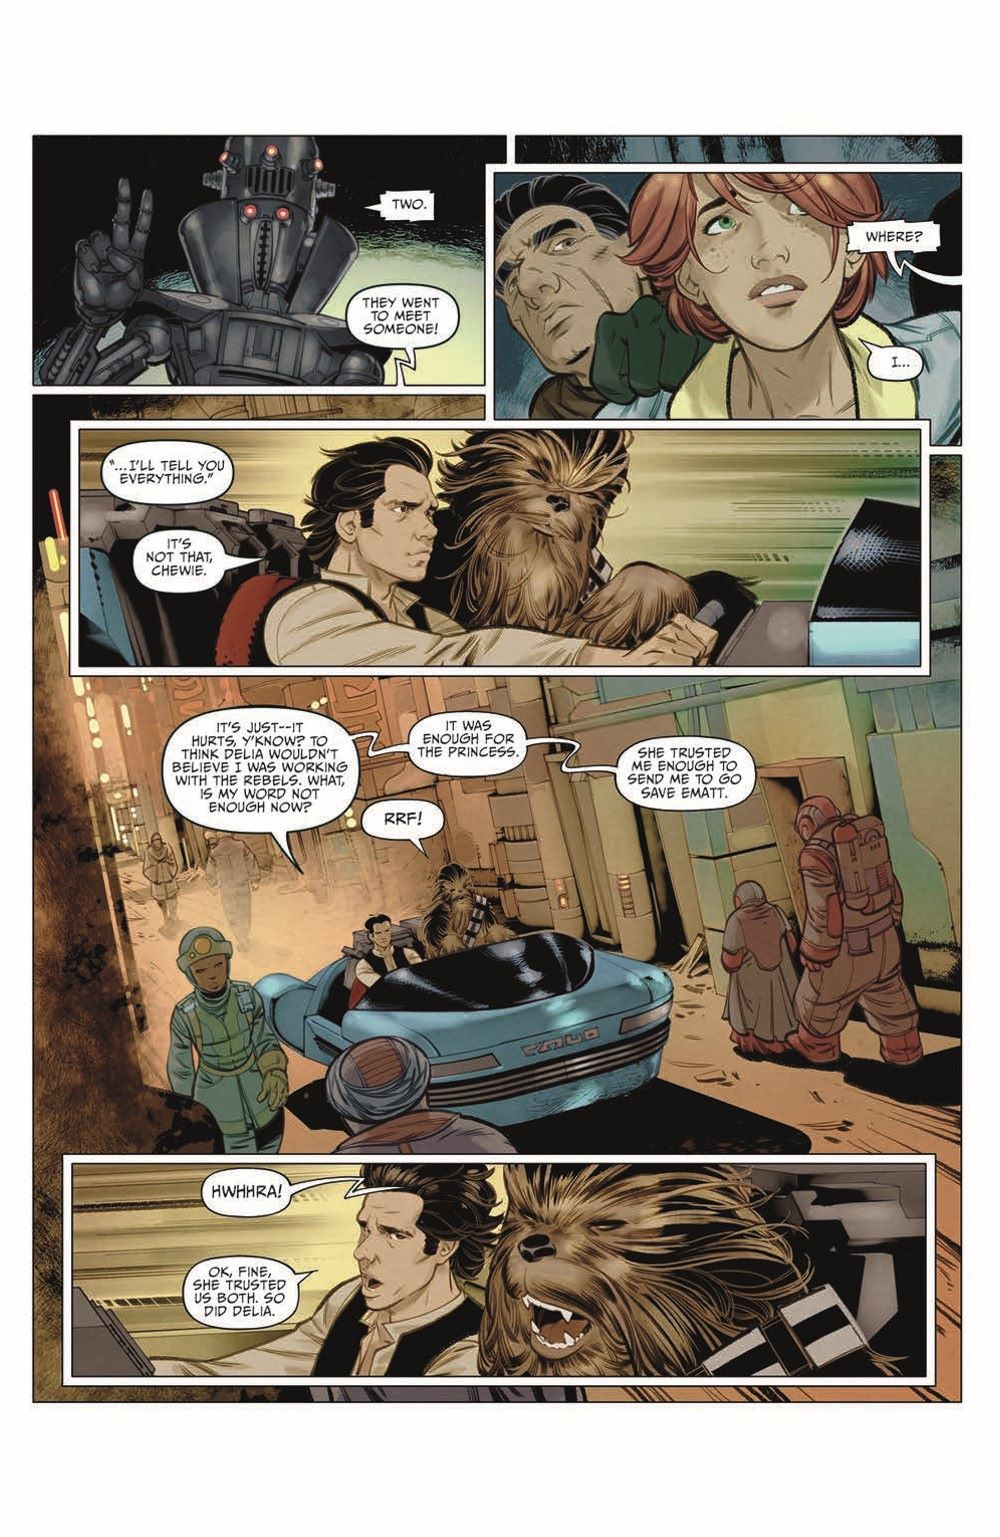 SWA_Smuggler02_pr-4 ComicList Previews: STAR WARS ADVENTURES SMUGGLER'S RUN #2 (OF 2)